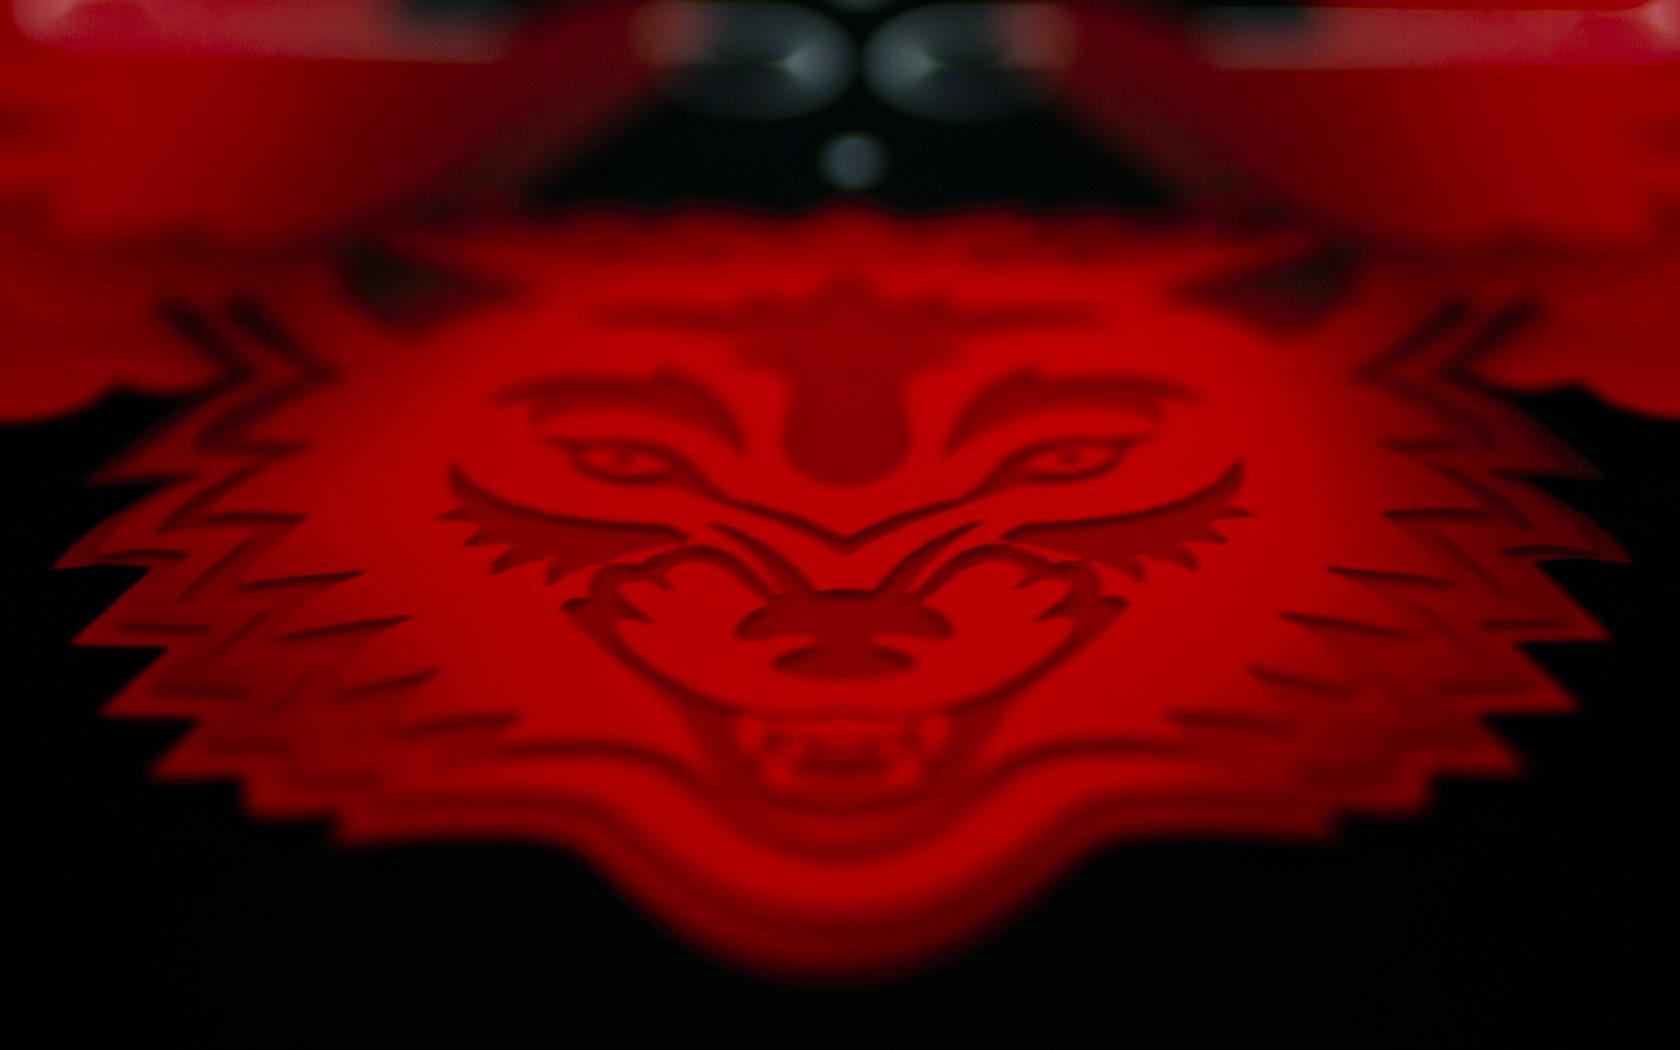 'Red Rising' de Pierce Brown